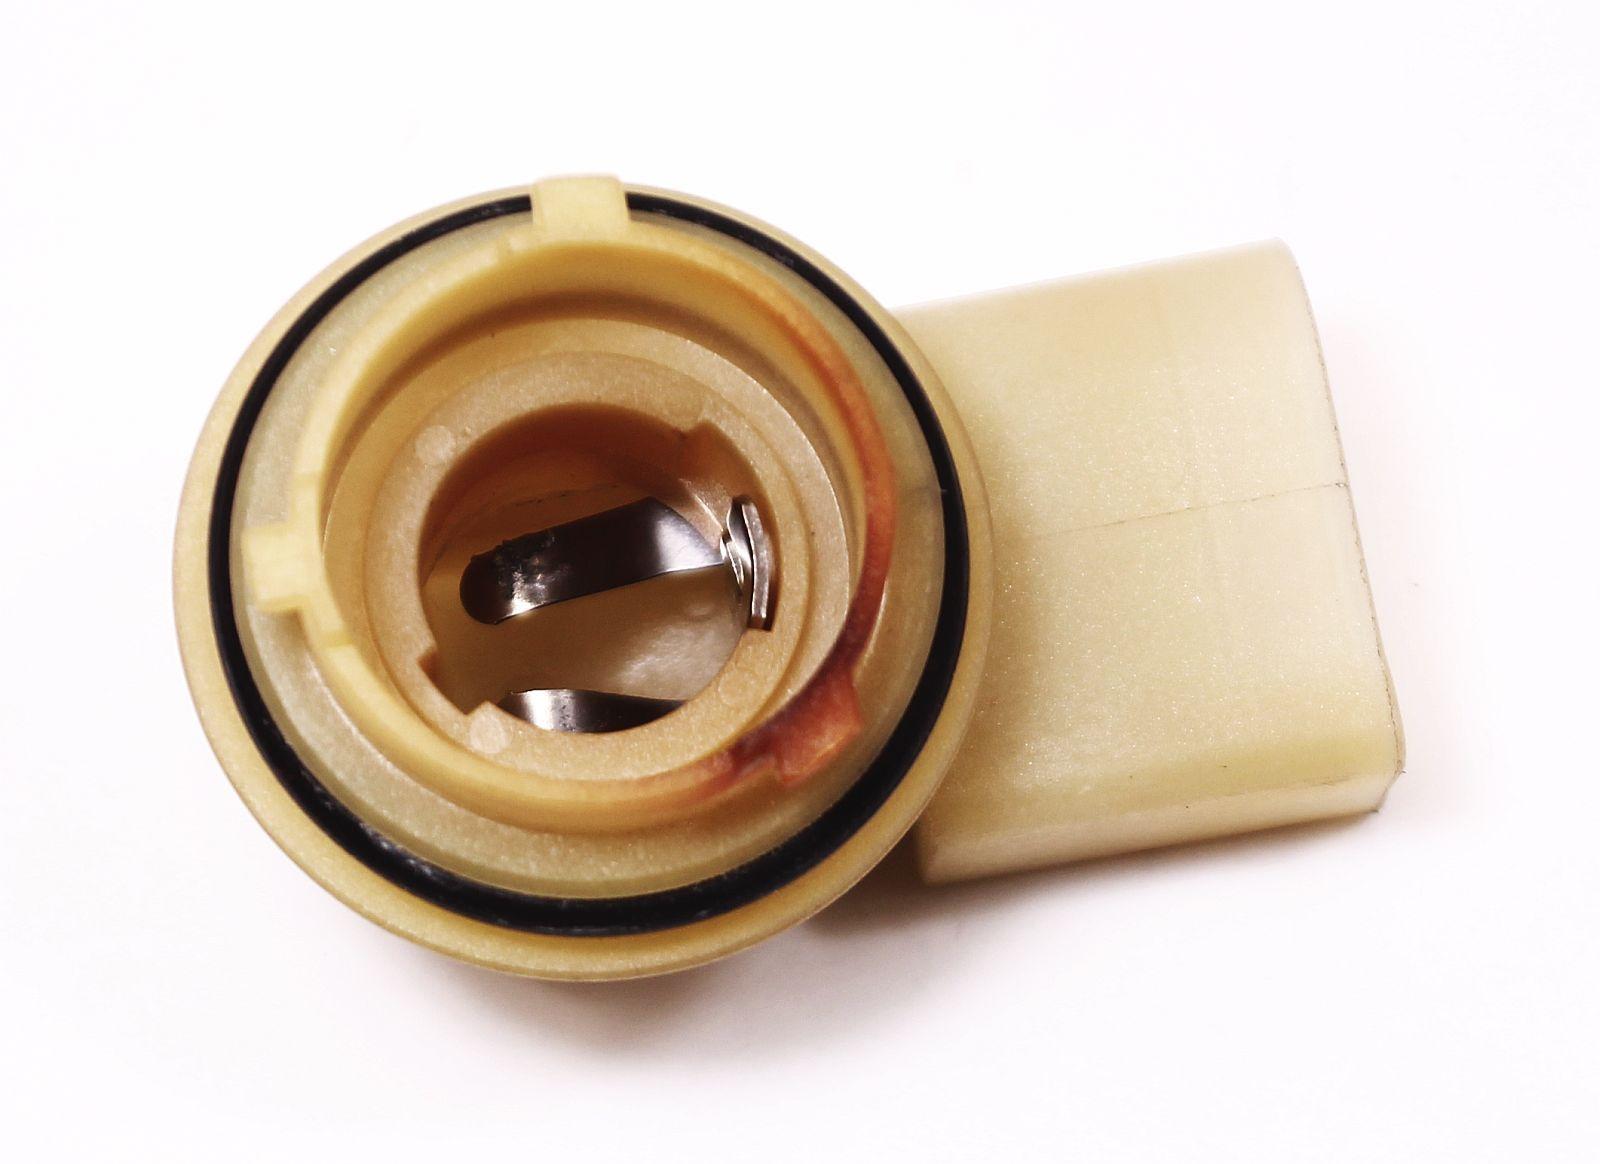 Taillight Bulb Socket Vw Beetle Tail Light Lamp Holder 3 Pin Genuine Carparts4sale Inc: light bulb socket